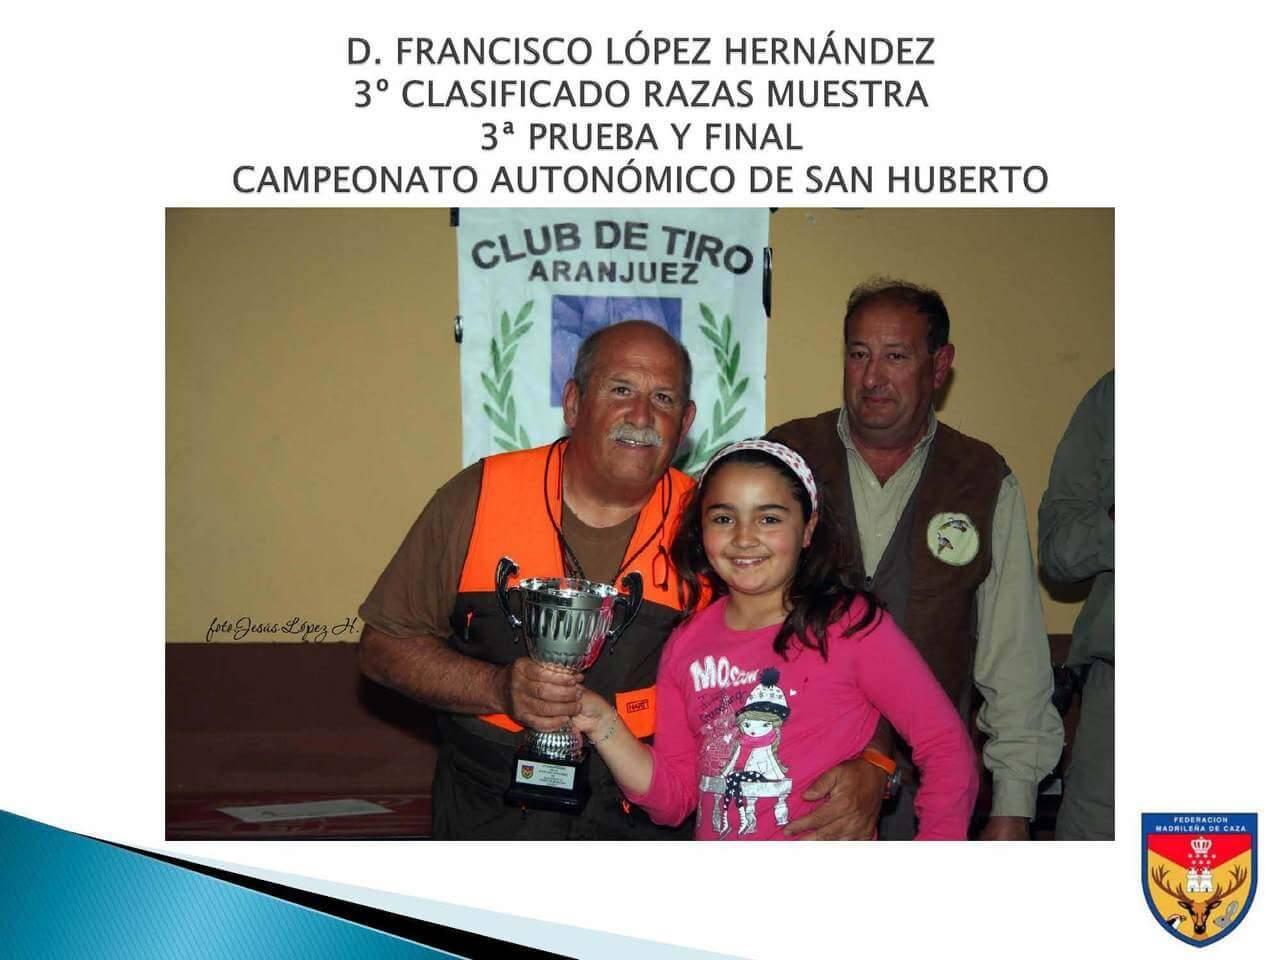 Campeonato autonómico San Huberto 2017